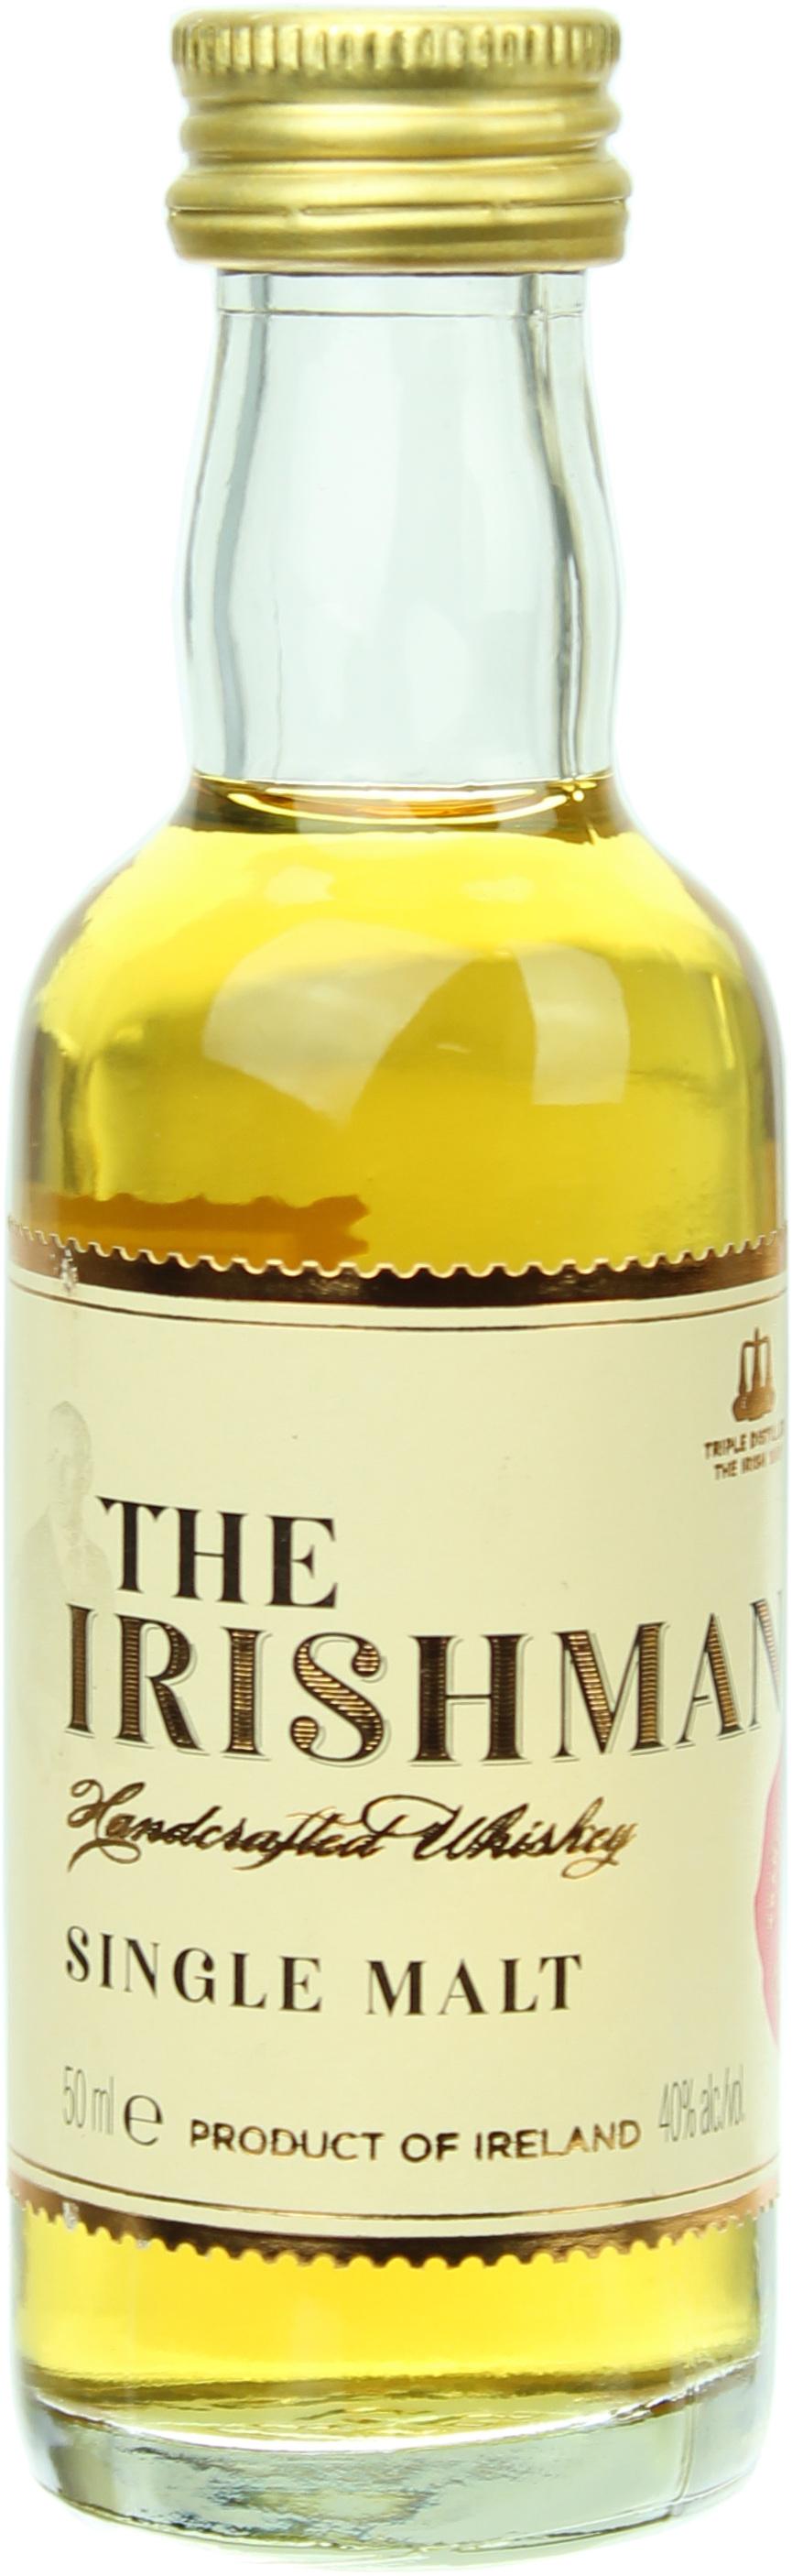 miniatur the irishman single malt whiskey 40 0 0 05l. Black Bedroom Furniture Sets. Home Design Ideas